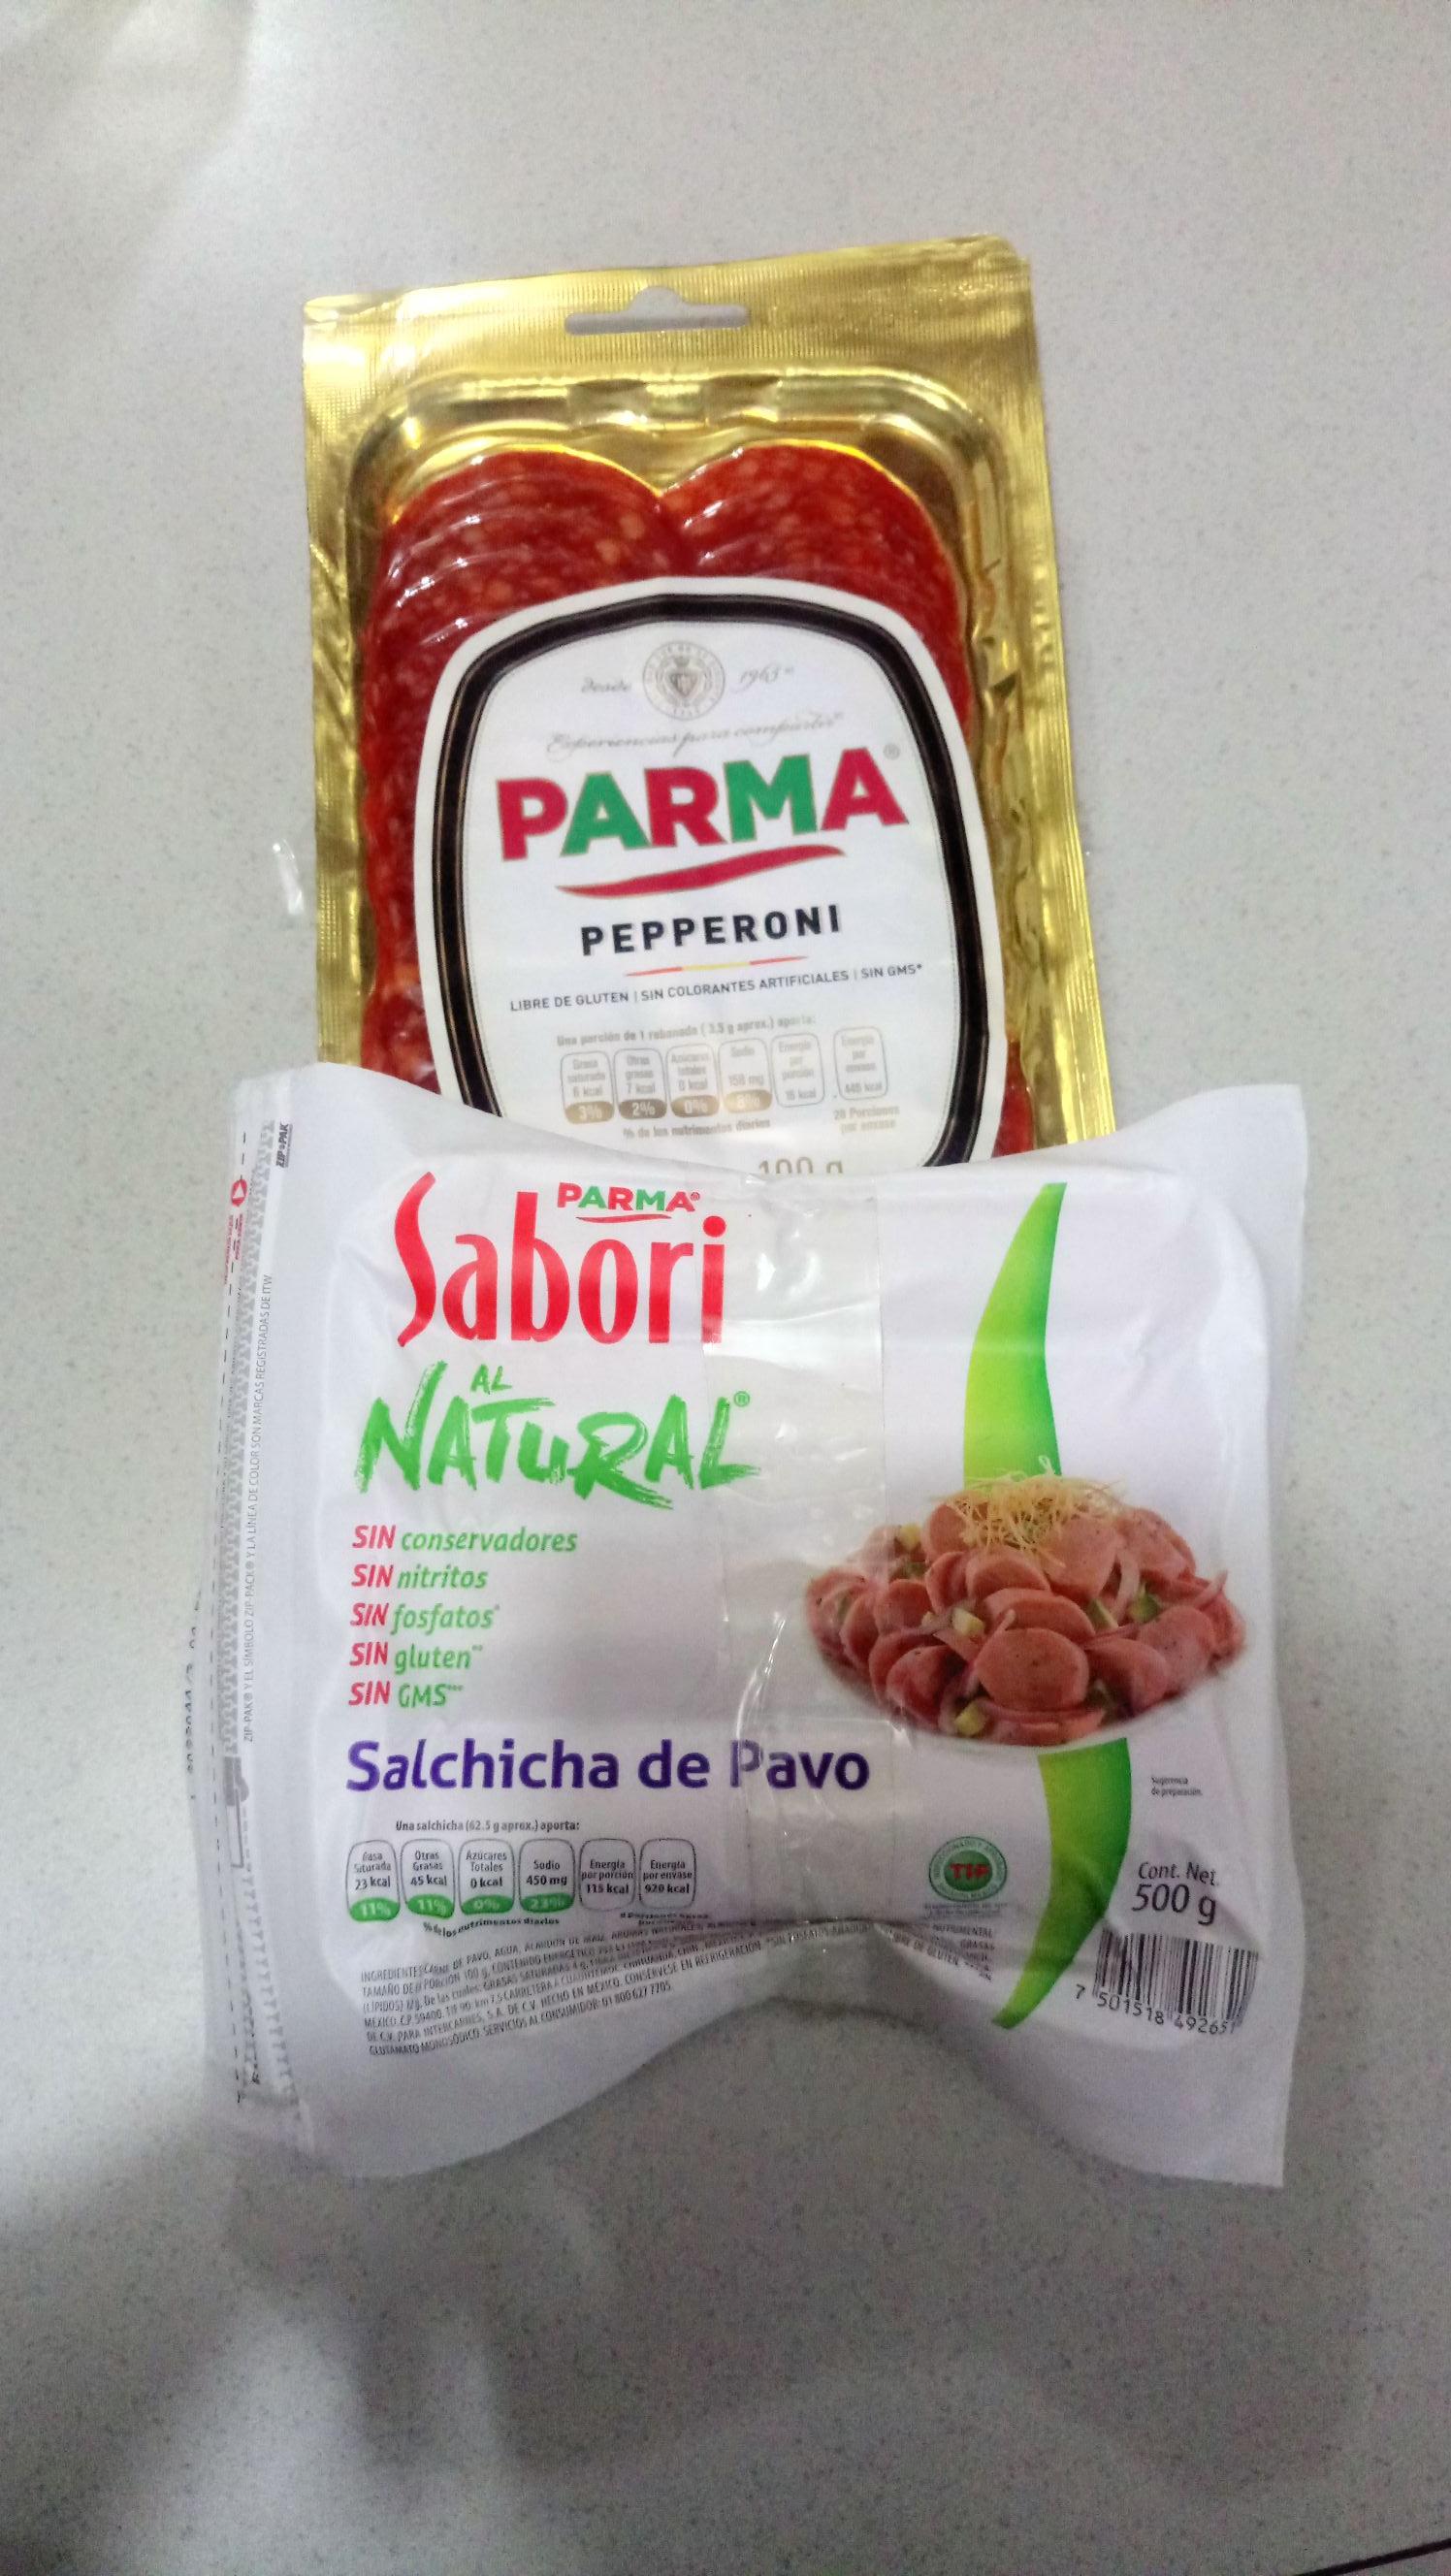 Walmart: Paquete Salchicha Sabori de Pavo + Pepperoni Parma